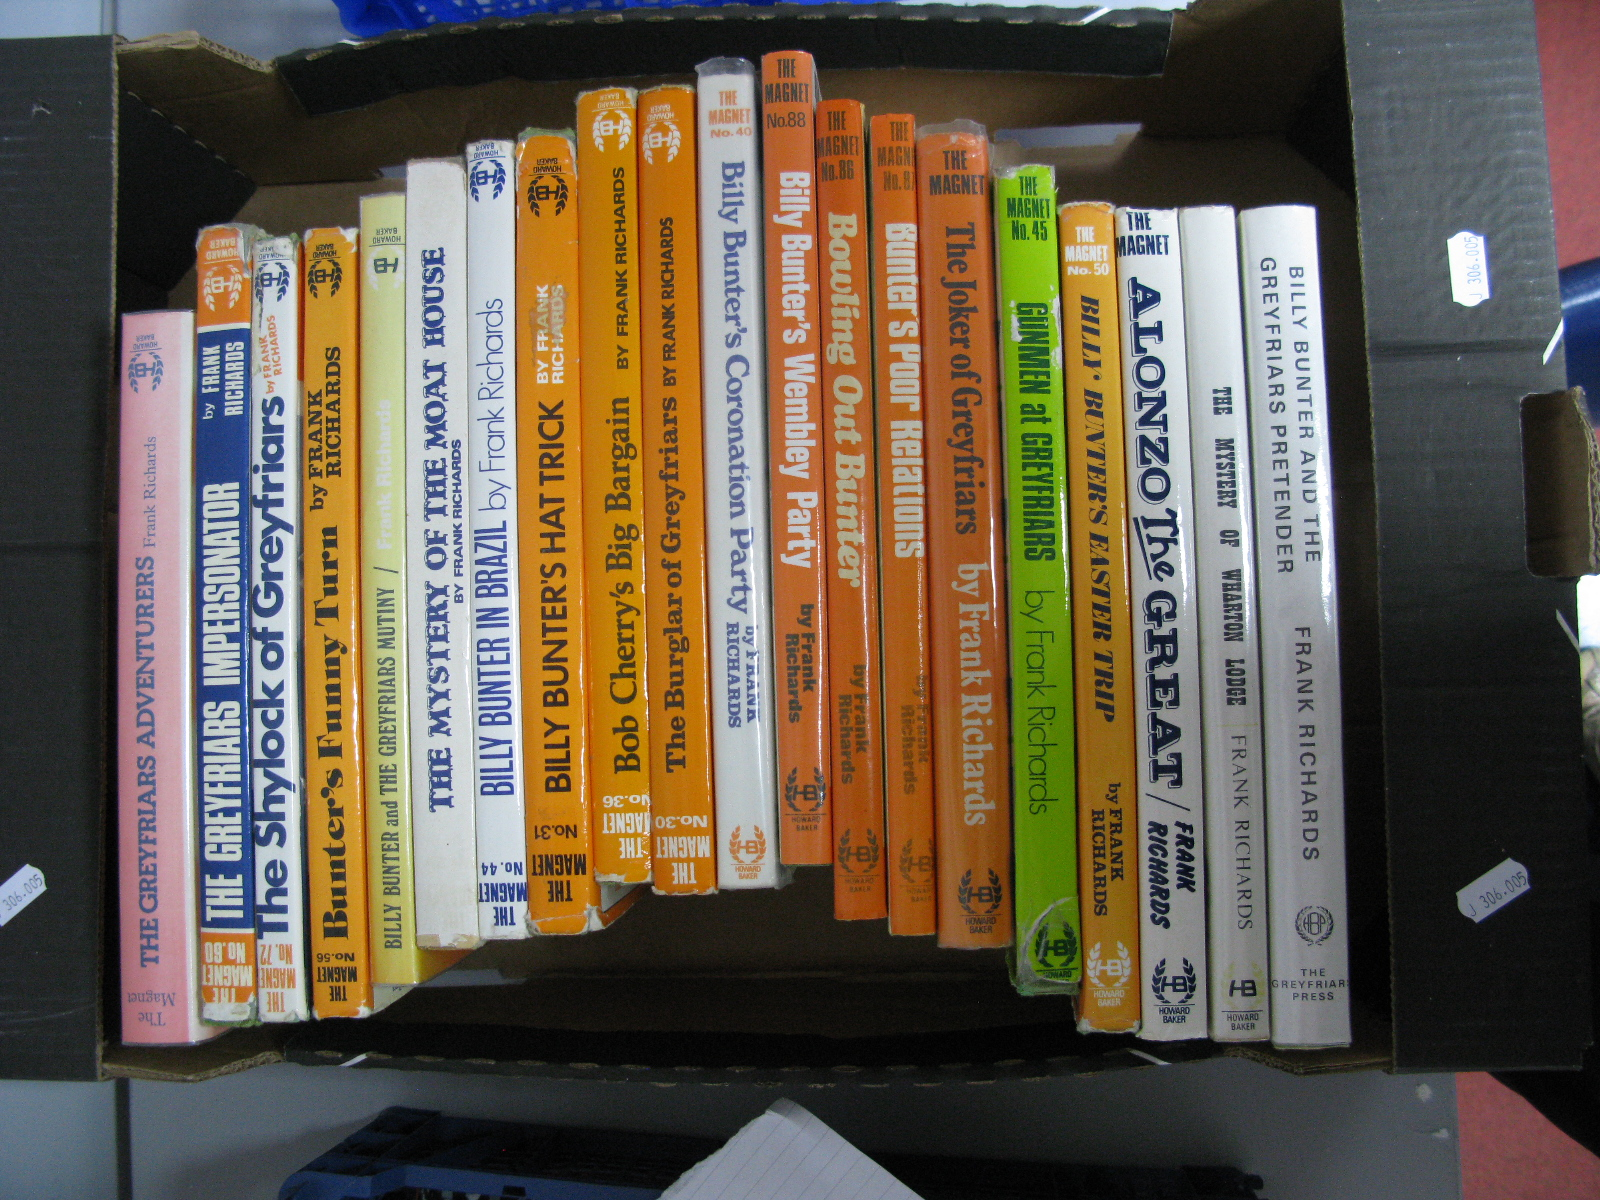 Lot 6 - Twenty Facsimile Hardback Copies of The Magnet, by Howard Baker Press 1970's. Frank Richards